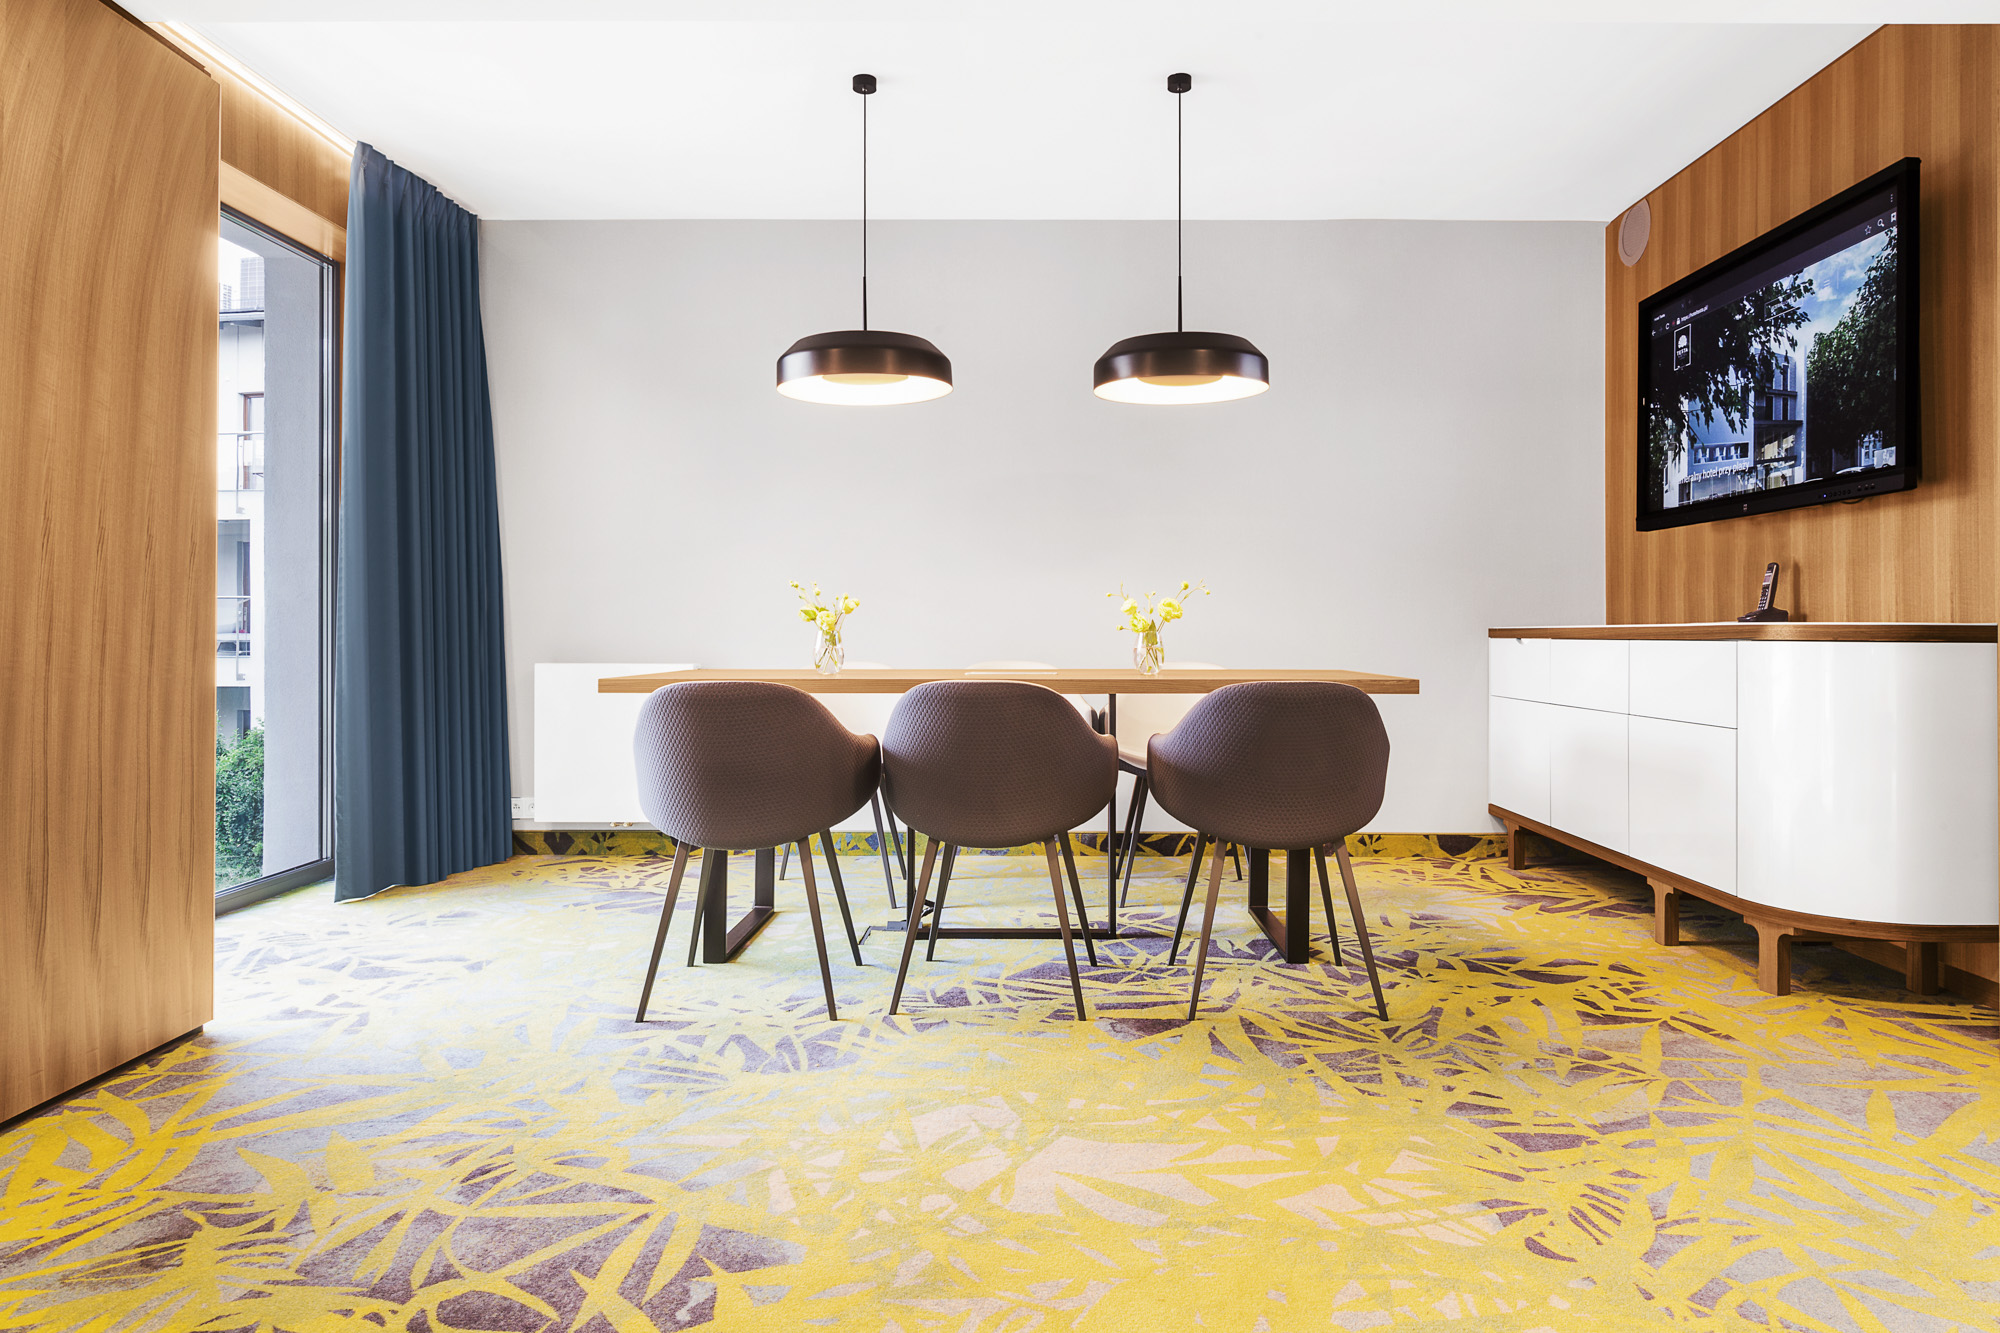 Hotel Testa - VIP room